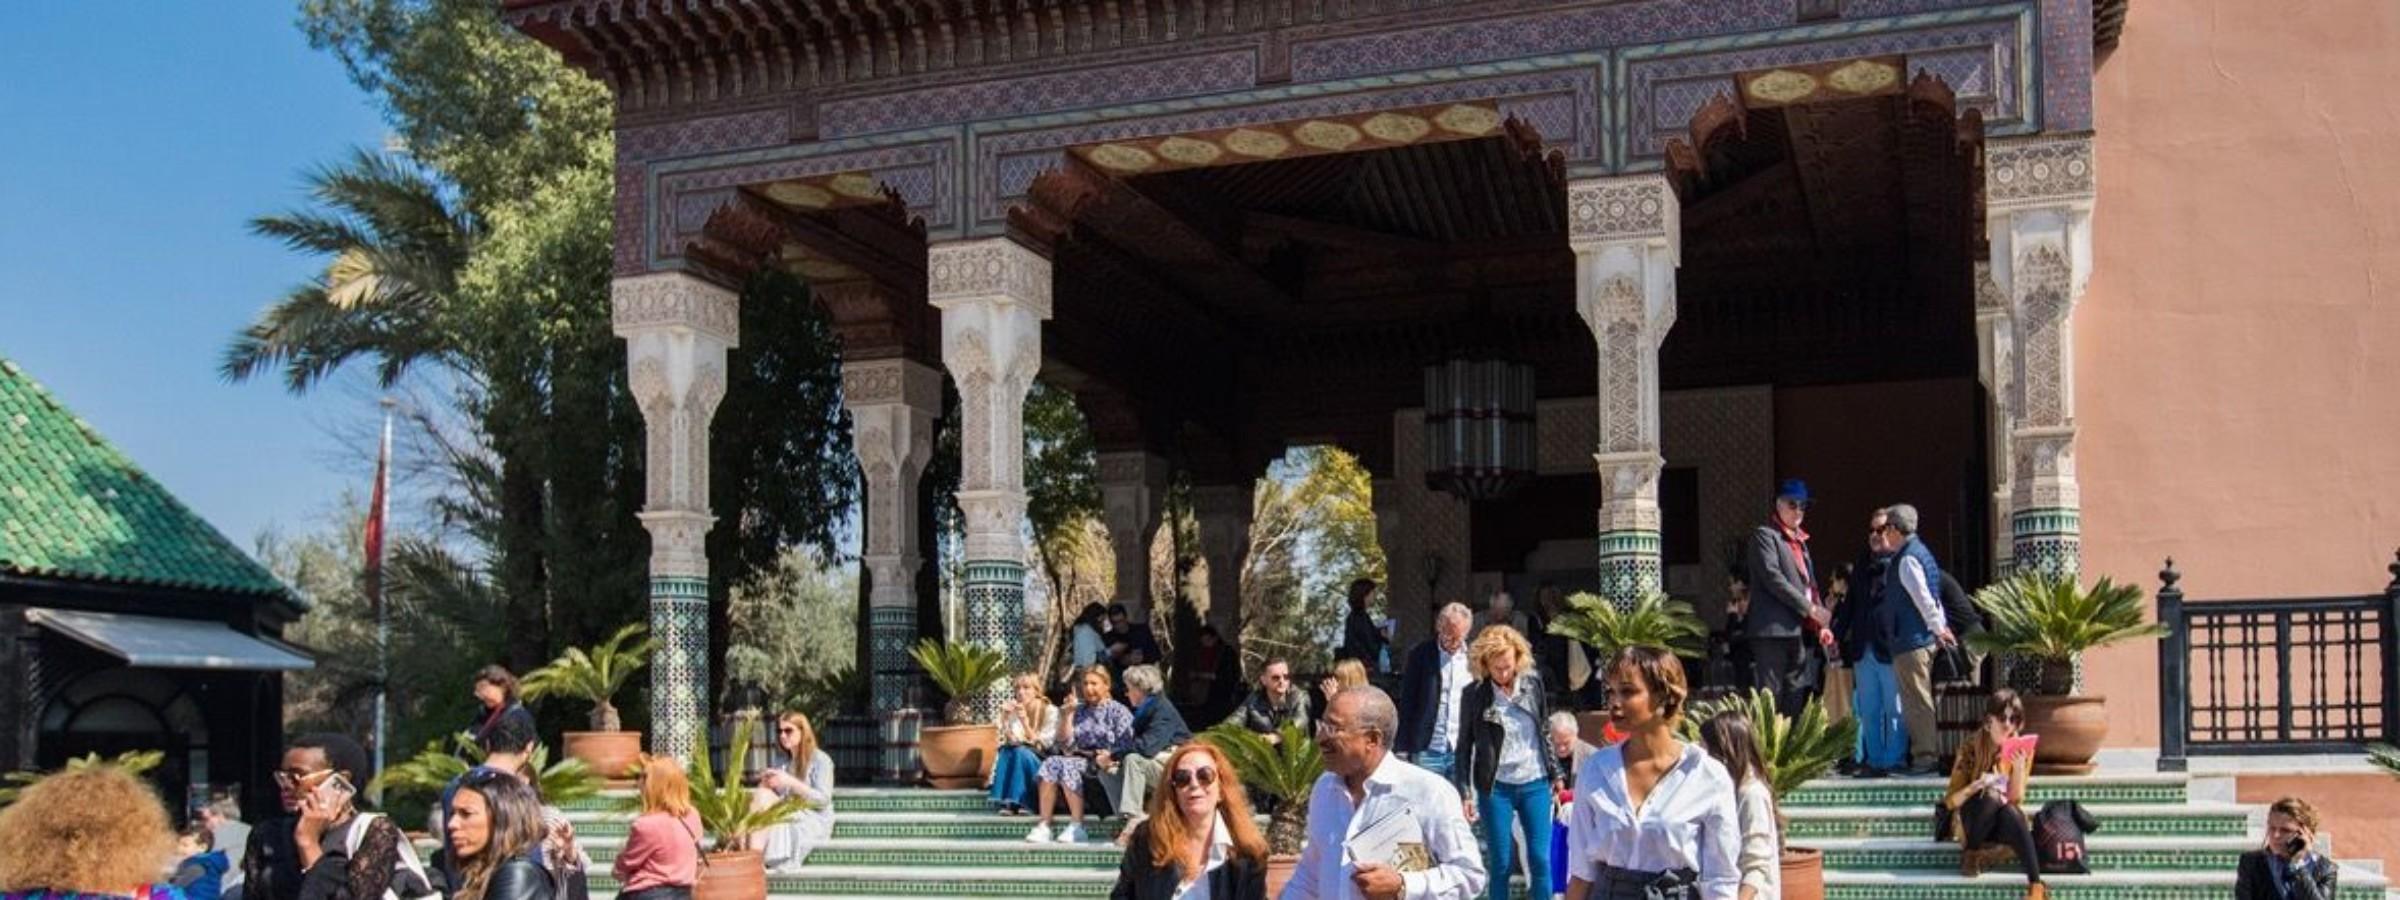 Photo by Adnane Zemmama. Courtesy of 1-54, Marrakech.